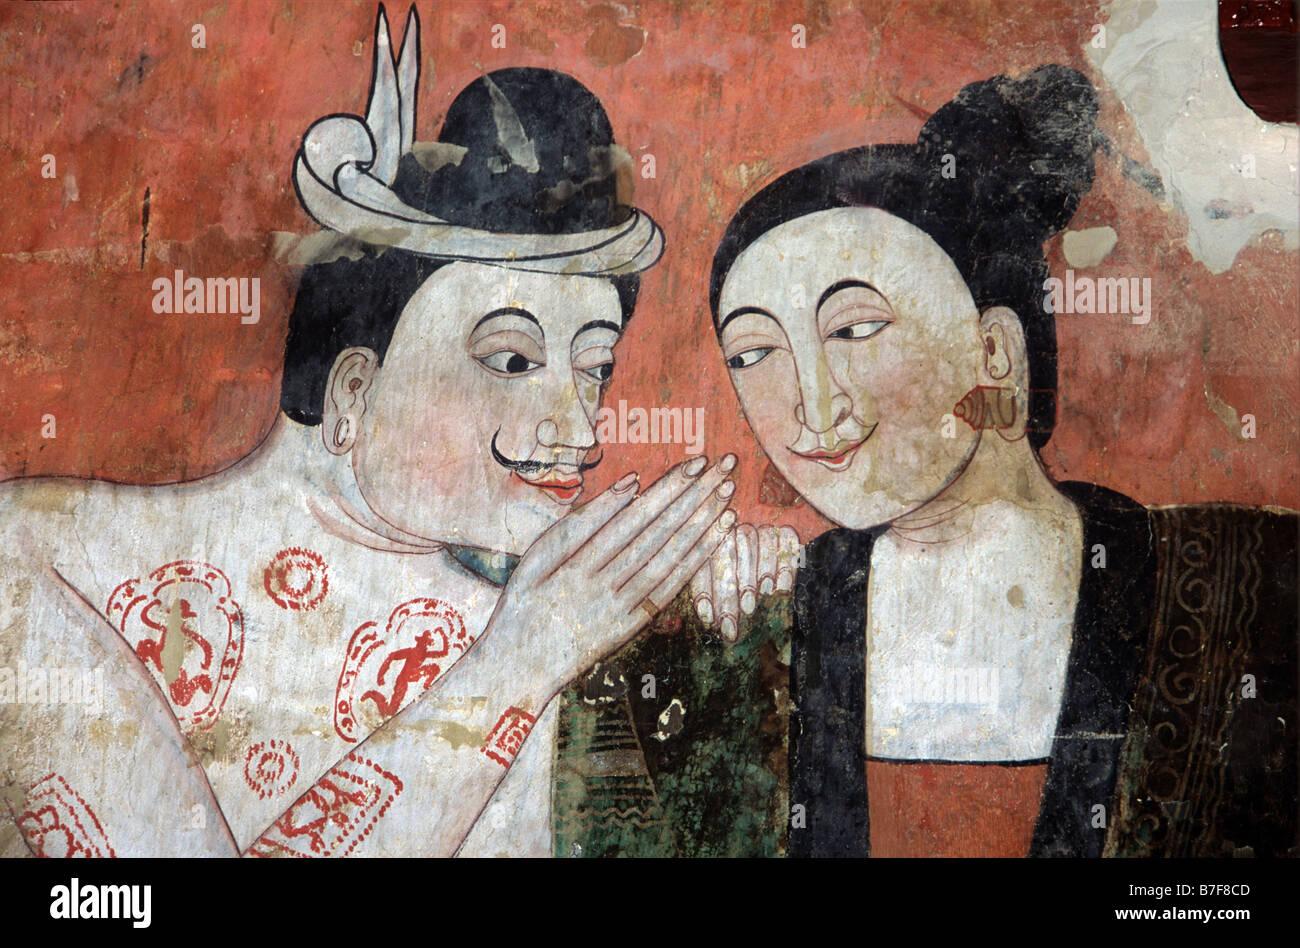 Thai-Liebhaber Verführung, c19th Wandbild oder Wandbild von Thit Buaphan, Wat Phumin Tempel, Nan, Nord-Thailand Stockbild